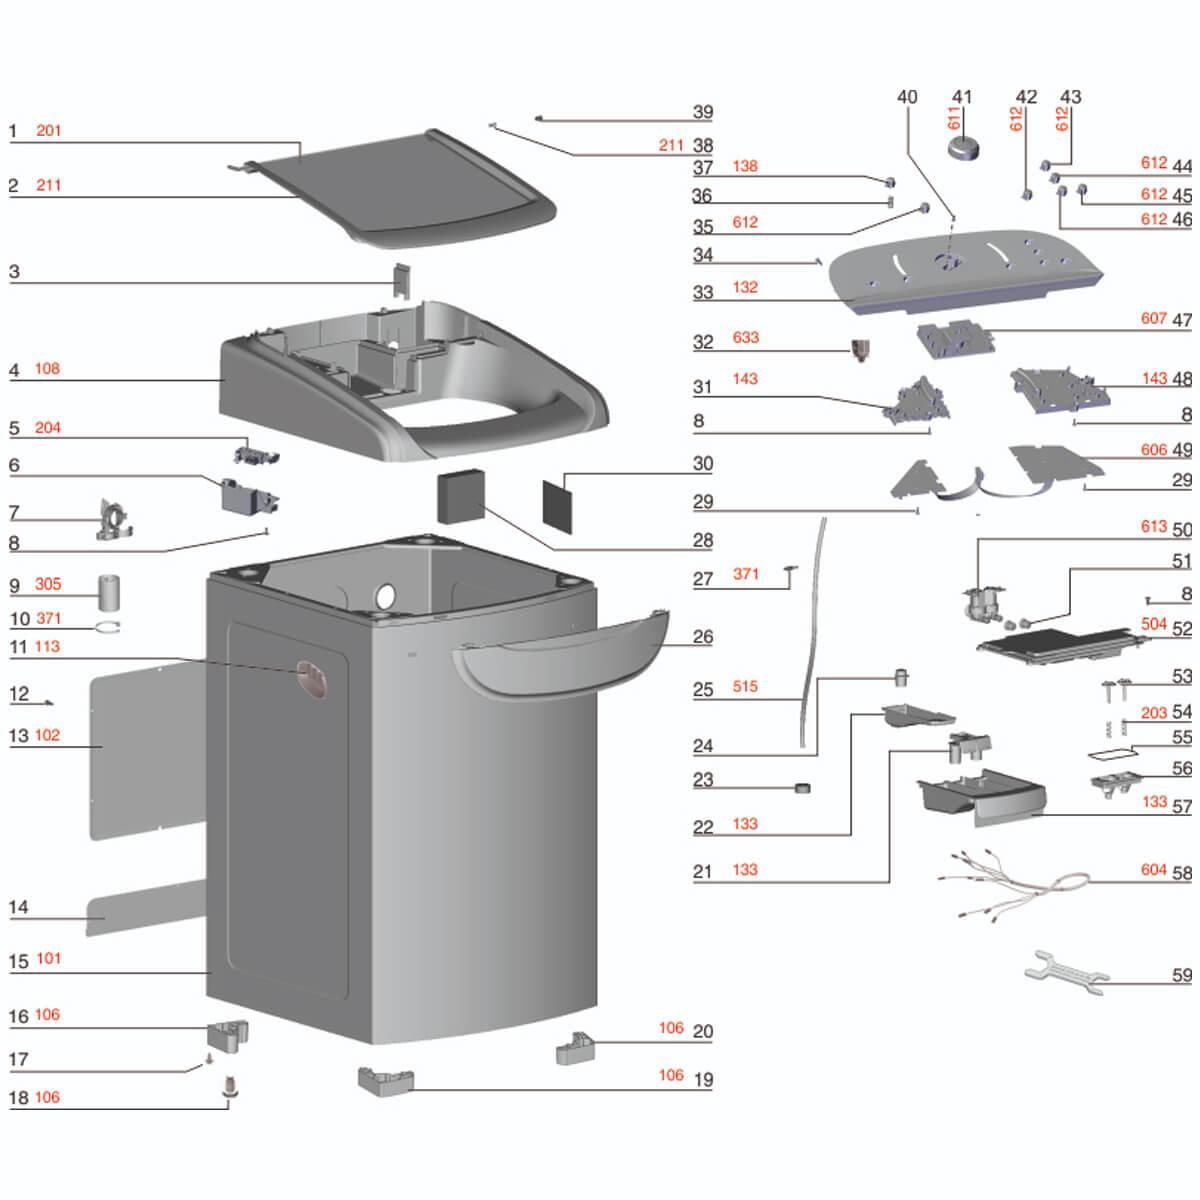 Placa De Potência Para Lavadora De Roupas Electrolux LTD16 - A99035108 A99035184